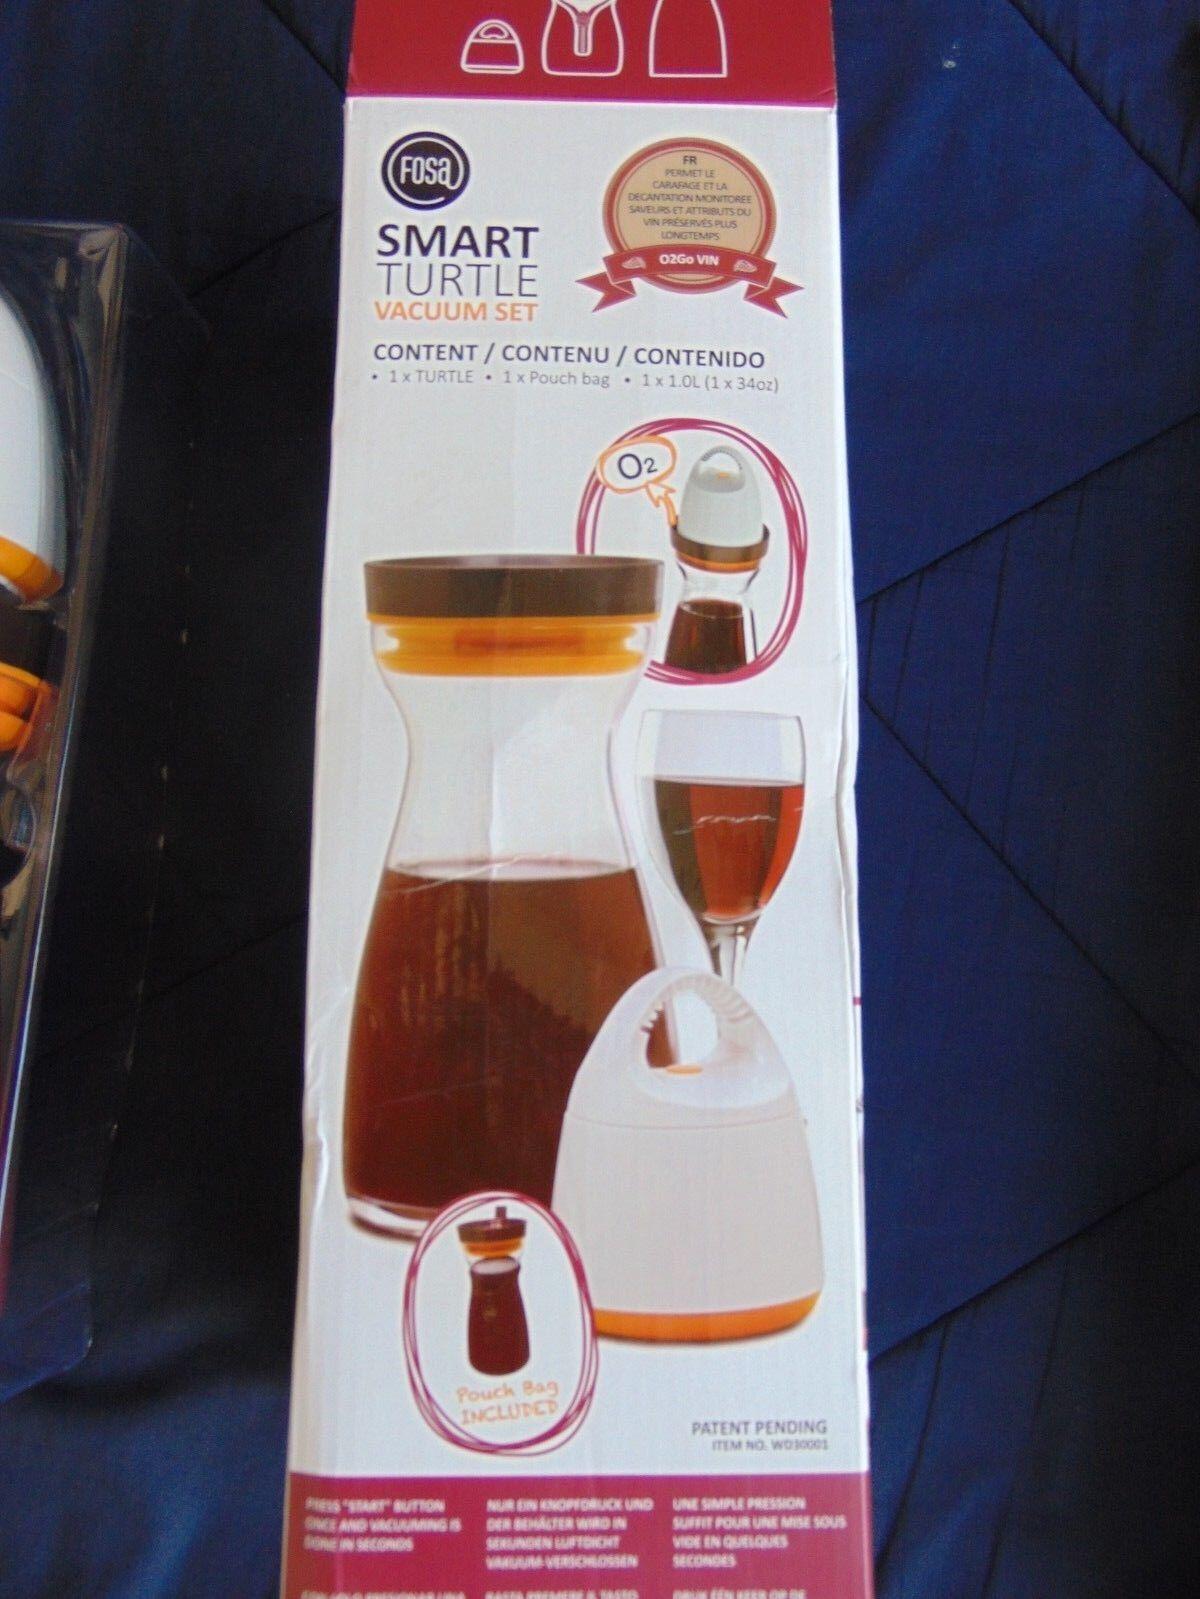 FOSA Smart Turtle Vacuum Set O2Go Wine O2 Beverages Wine Mon